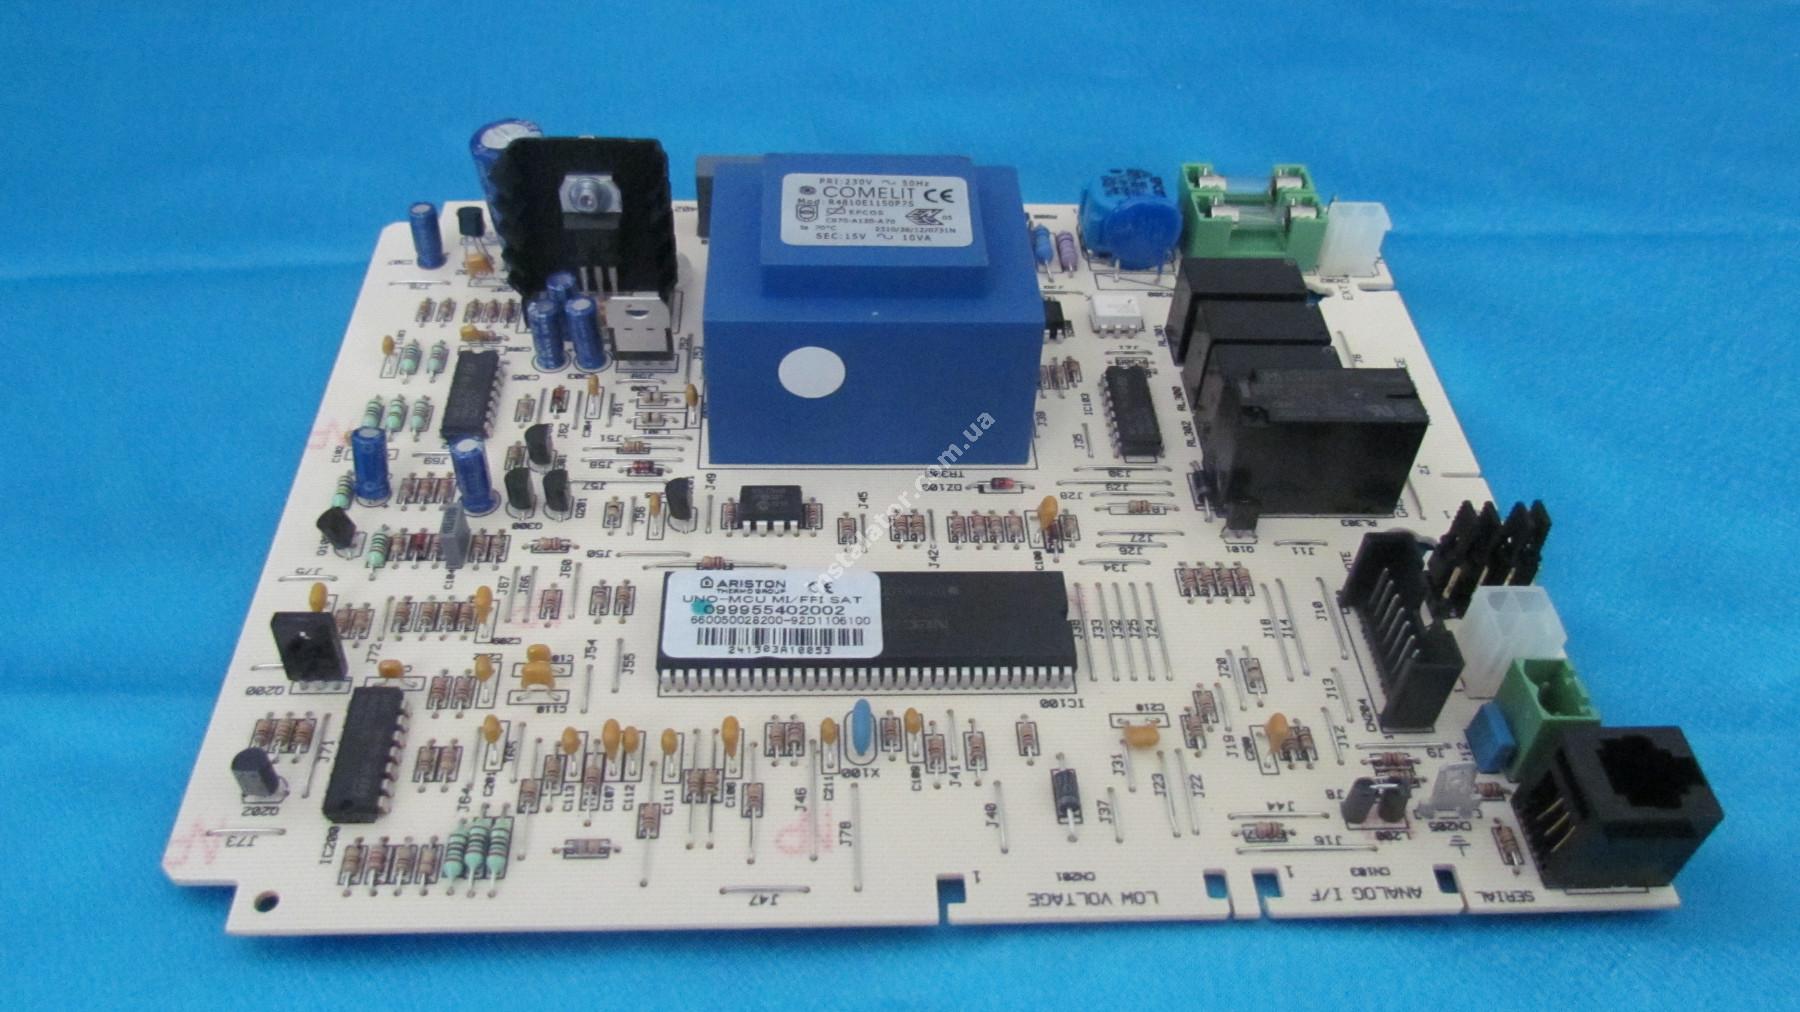 65100729 Плата електронна ARISTON Uno full-image-2